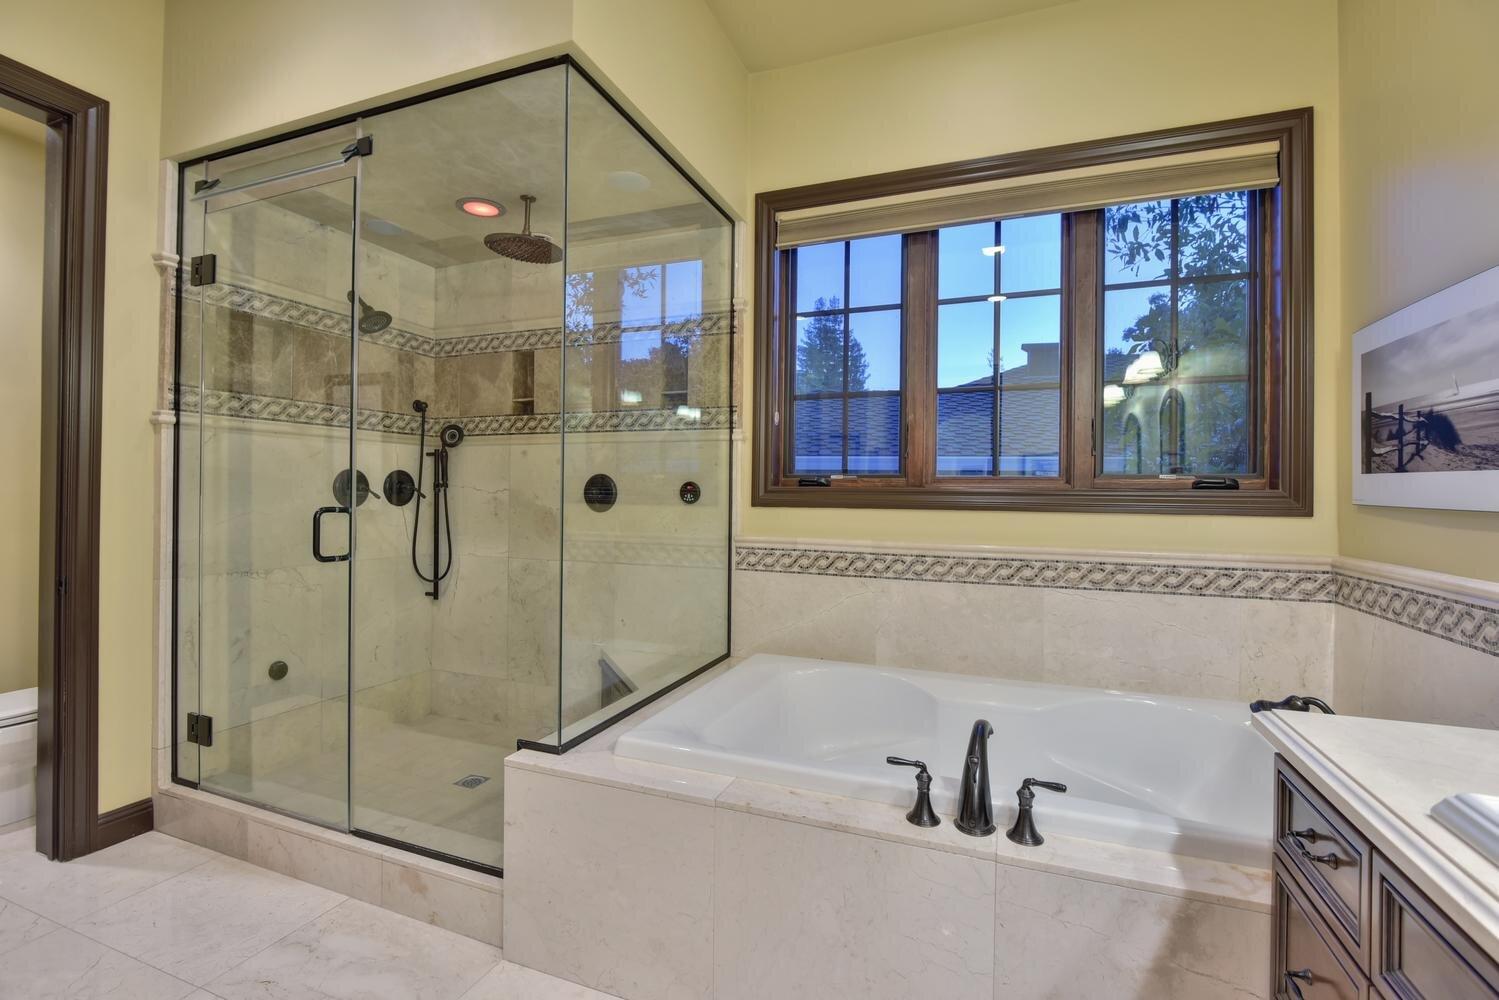 16021 Winterbrook Rd Los Gatos-large-038-001-Master Bathroom Shower and-1500x1000-72dpi.jpg